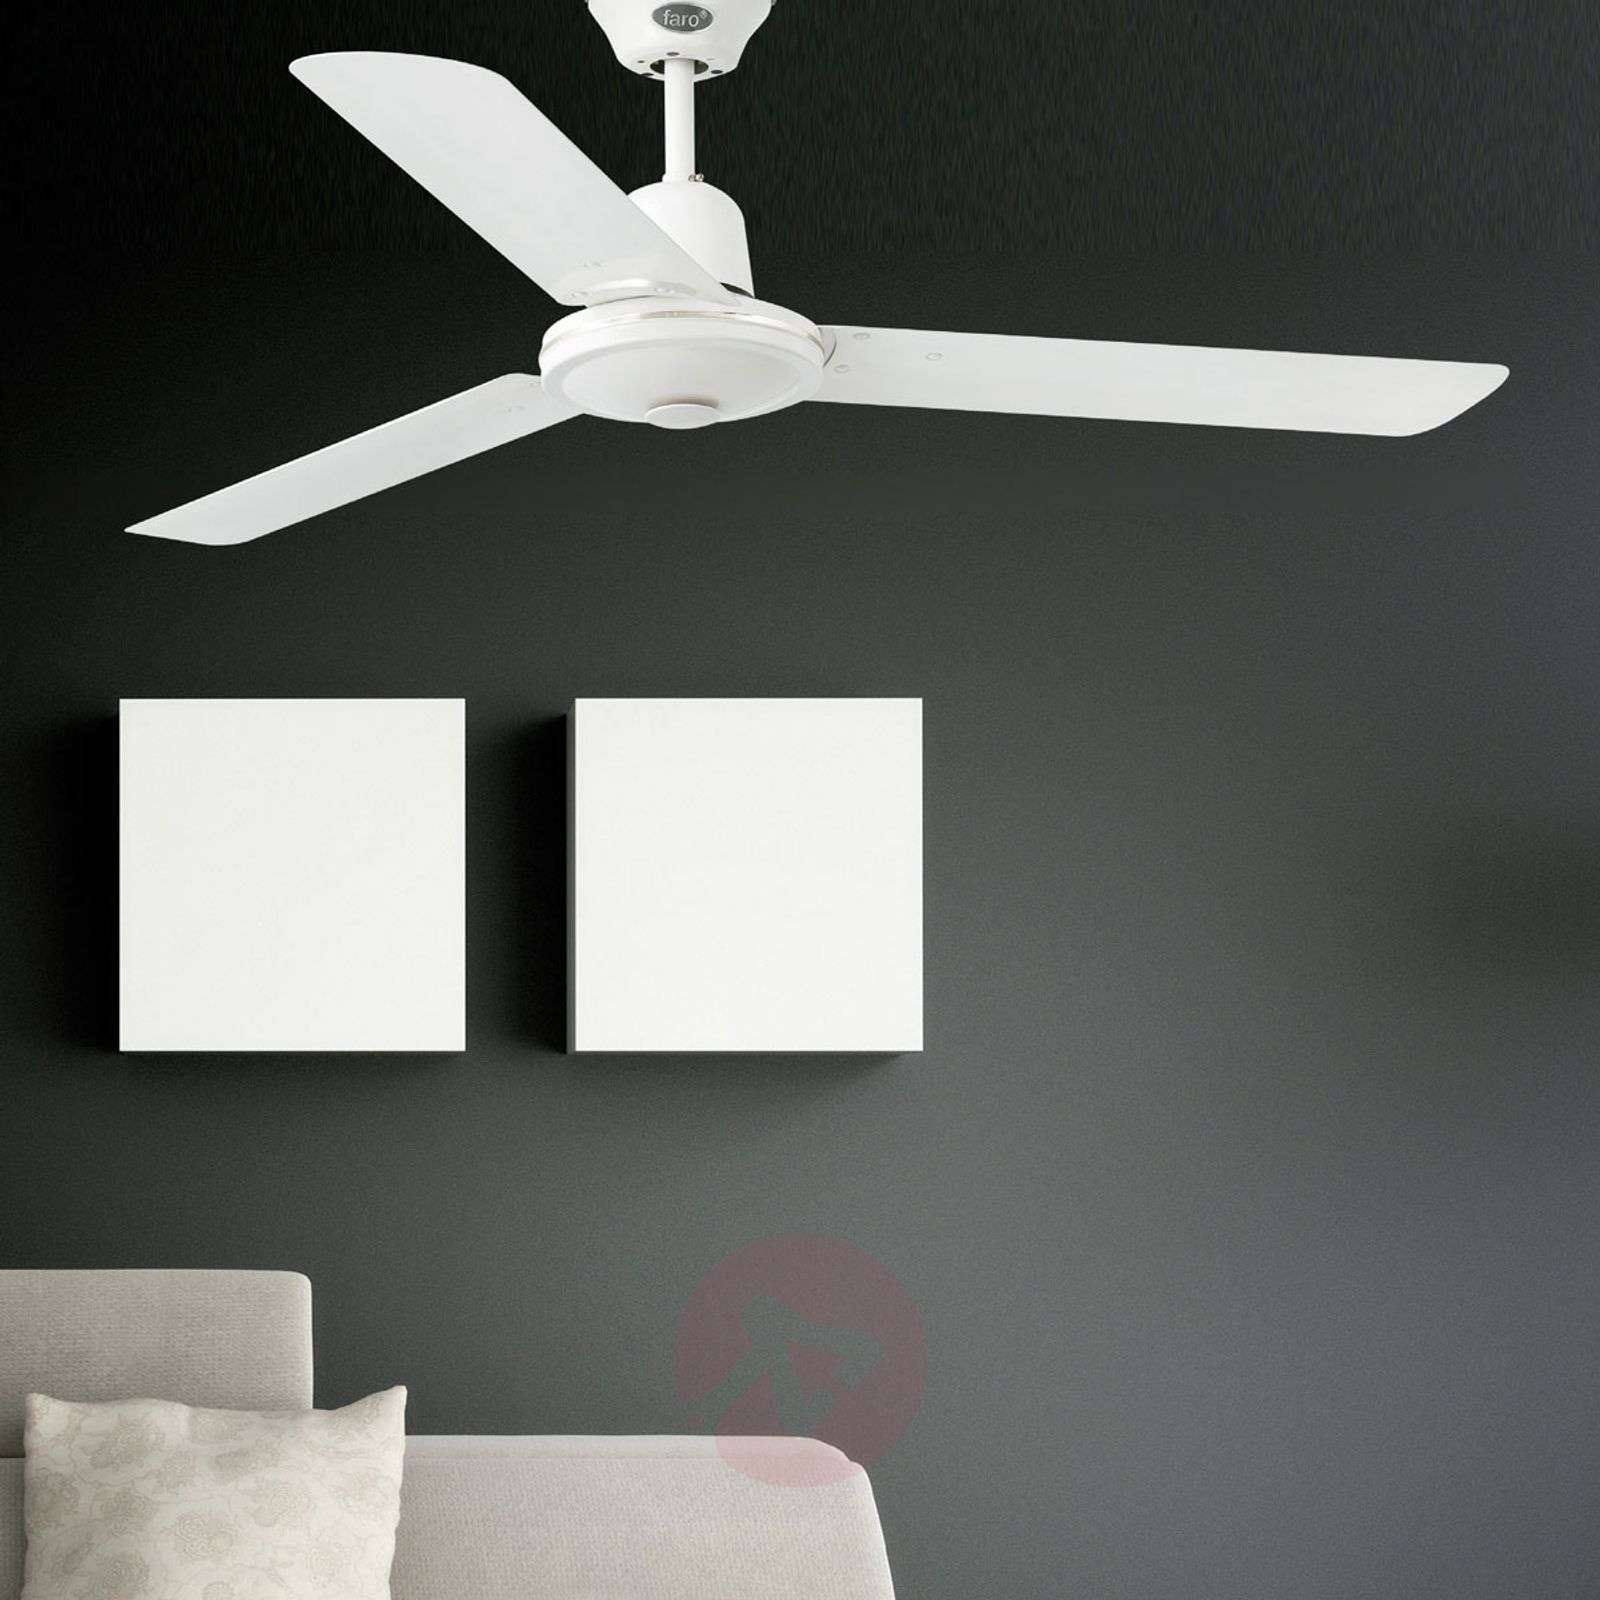 Linear ECO INDUS white ceiling fan-3506062-01